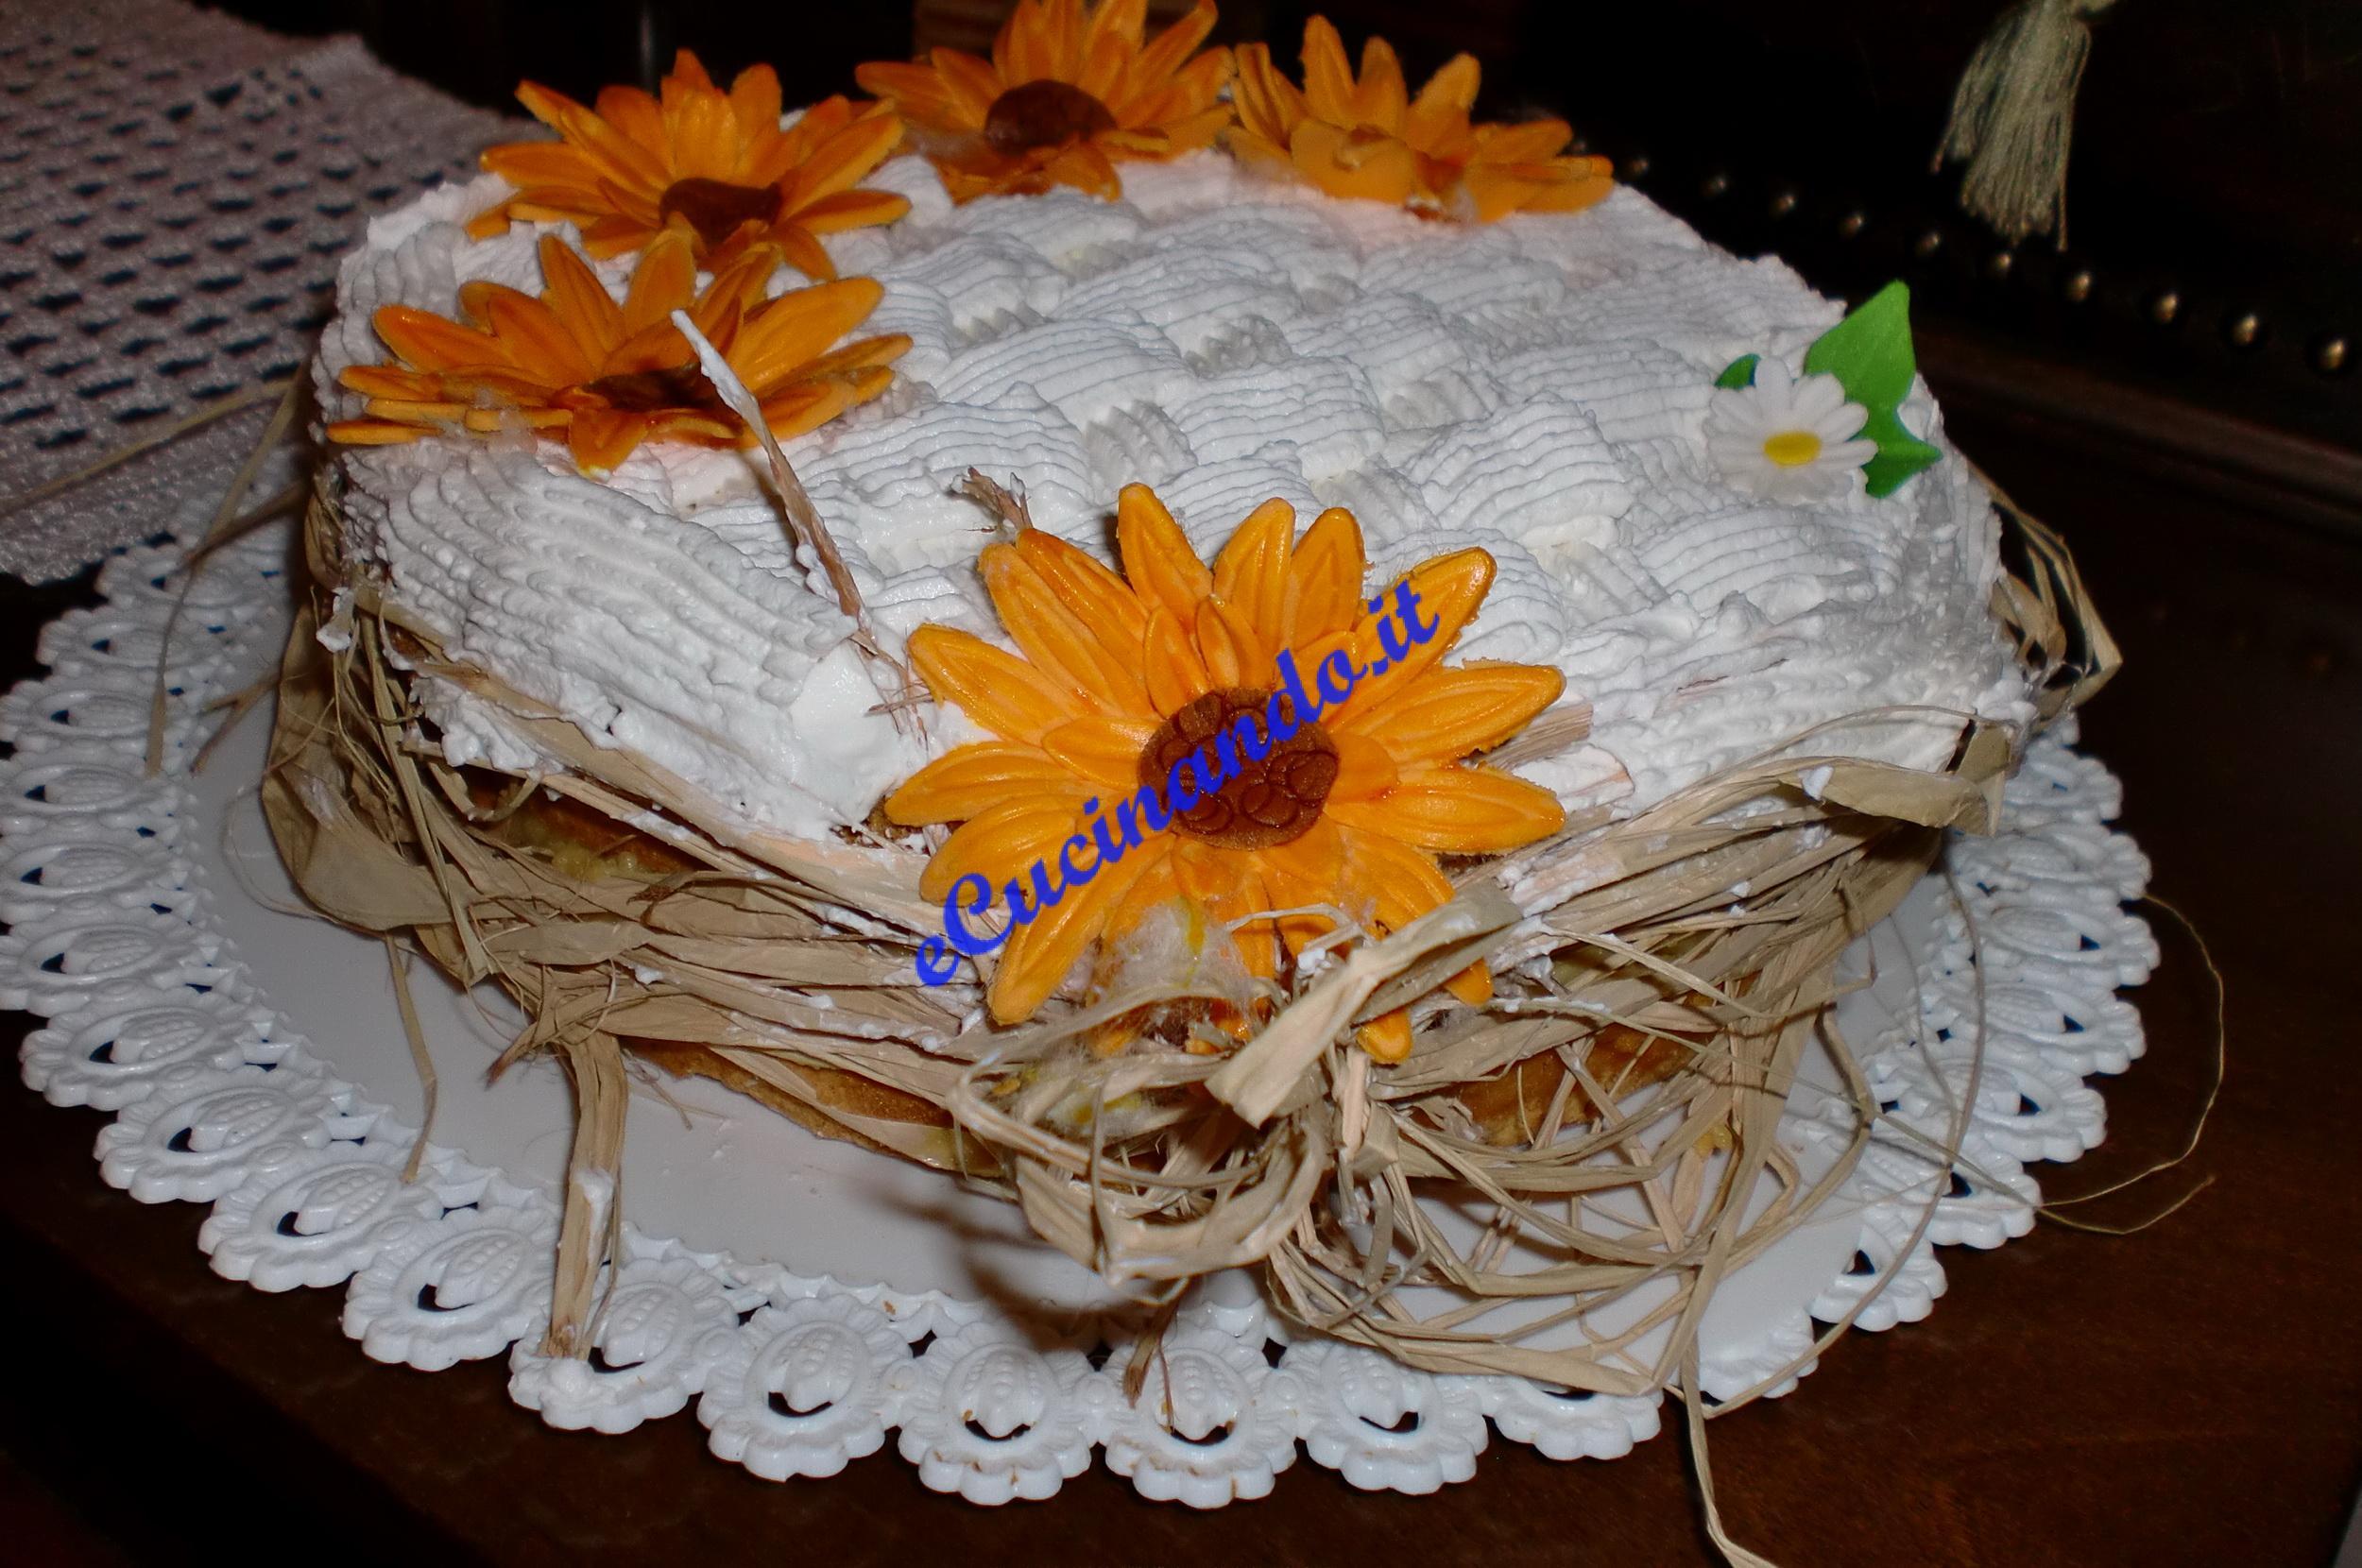 Torte Matrimonio Girasoli : Torta matrimonio girasoli dolci decorazionietentazioni